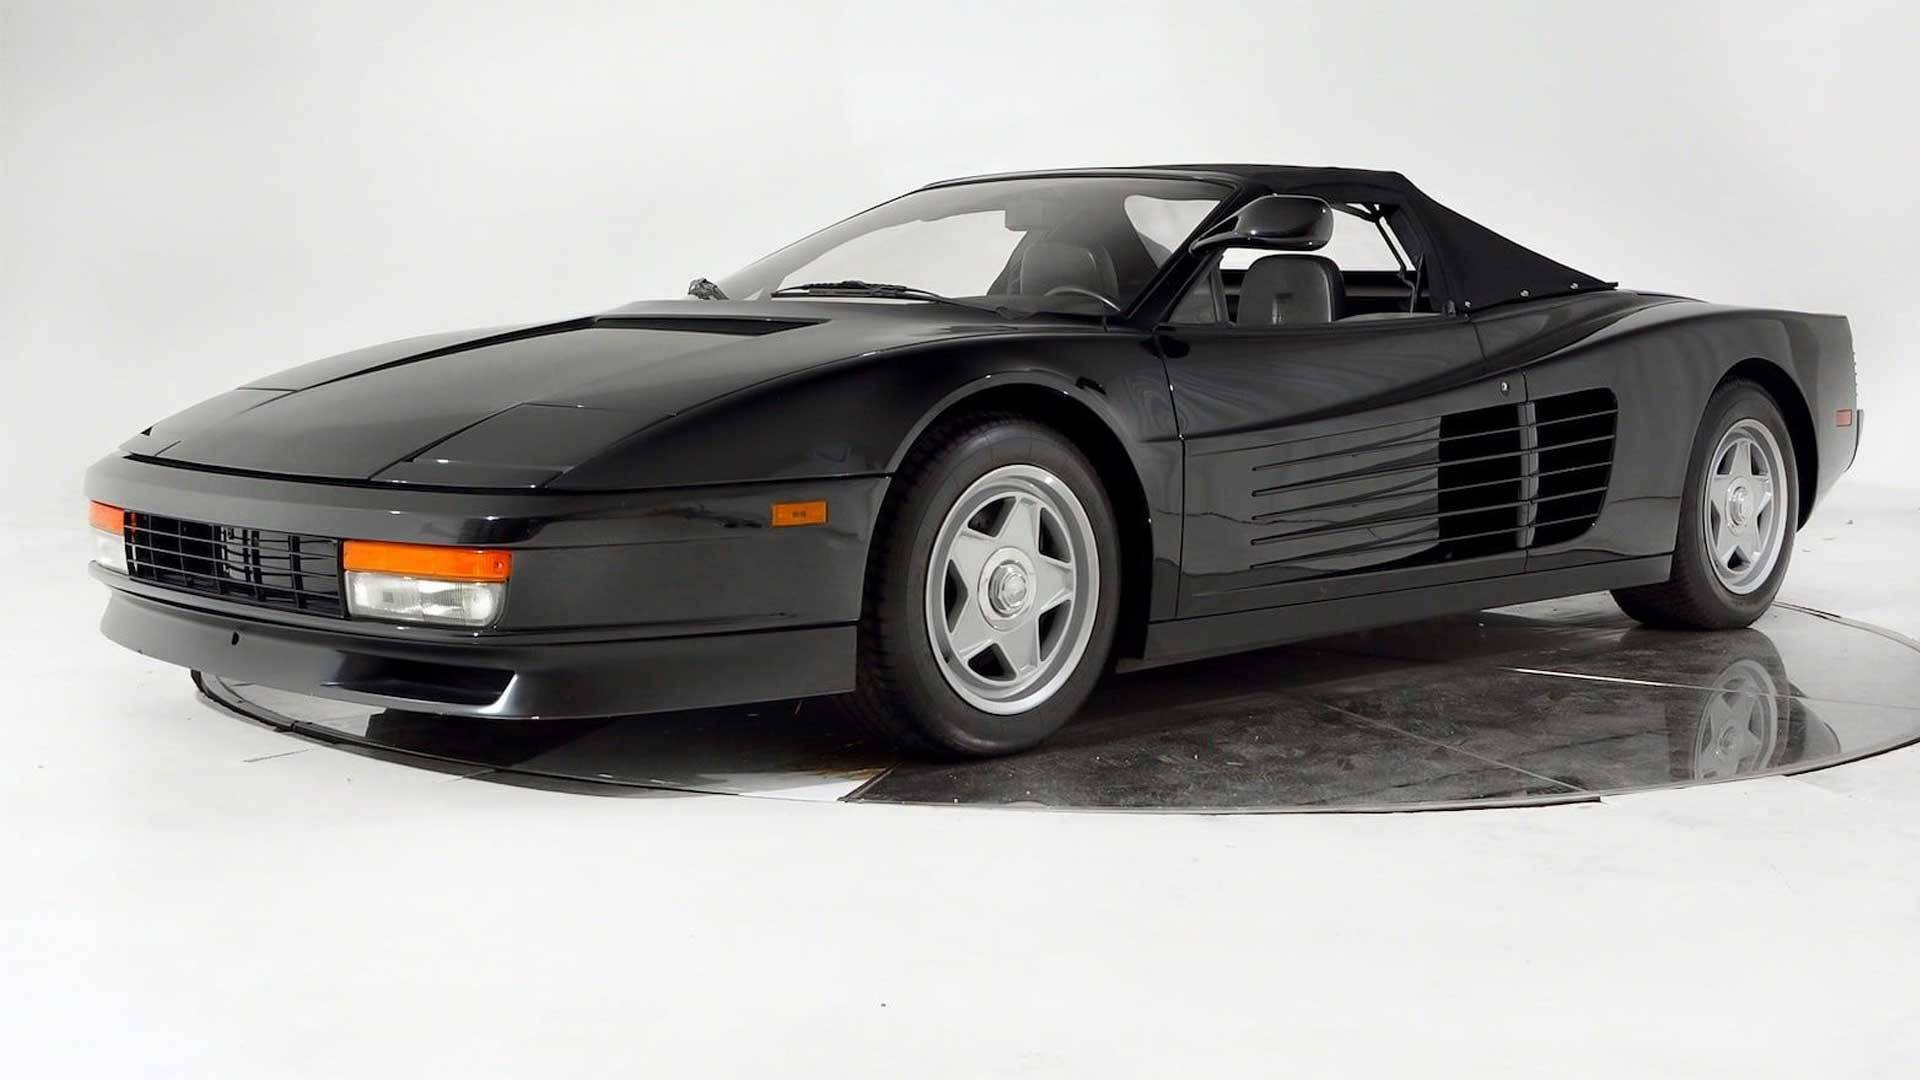 http://www.motormania.com.ua/wp-content/uploads/2017/12/1986-ferrari-testarossa-convertible-2.jpg